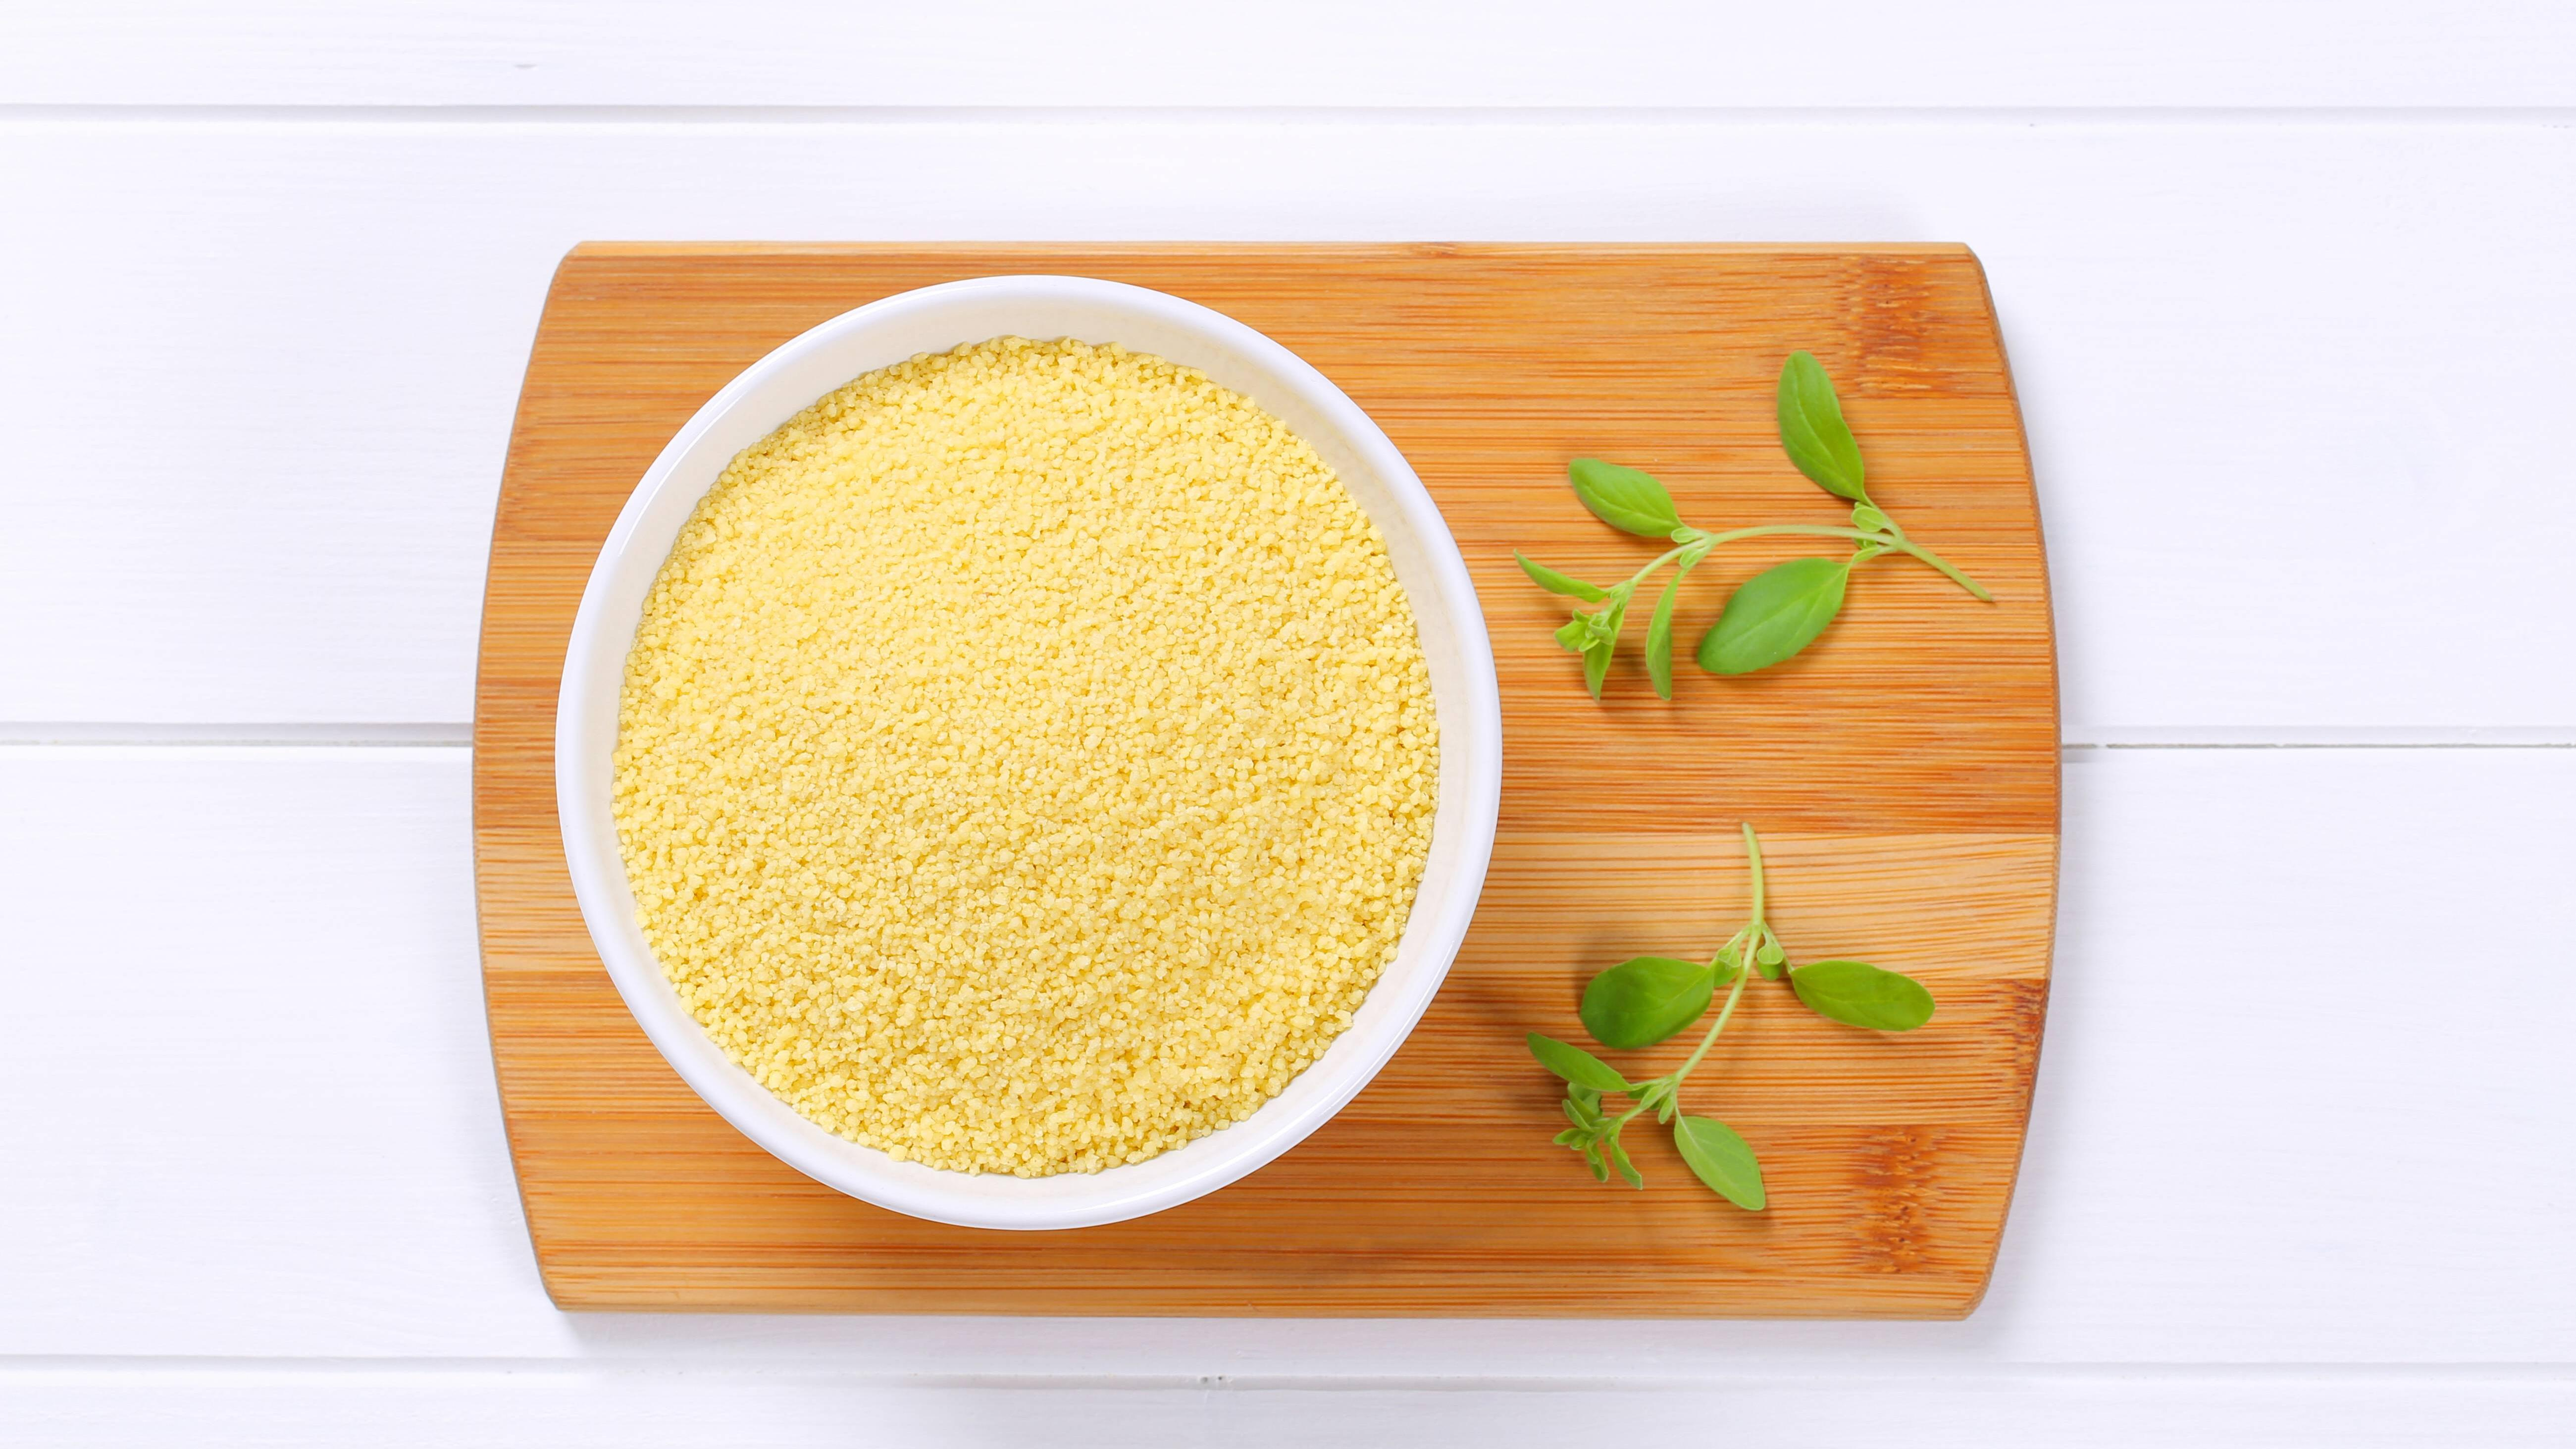 Couscous oder Reis: Wann welches Getreide besser ist